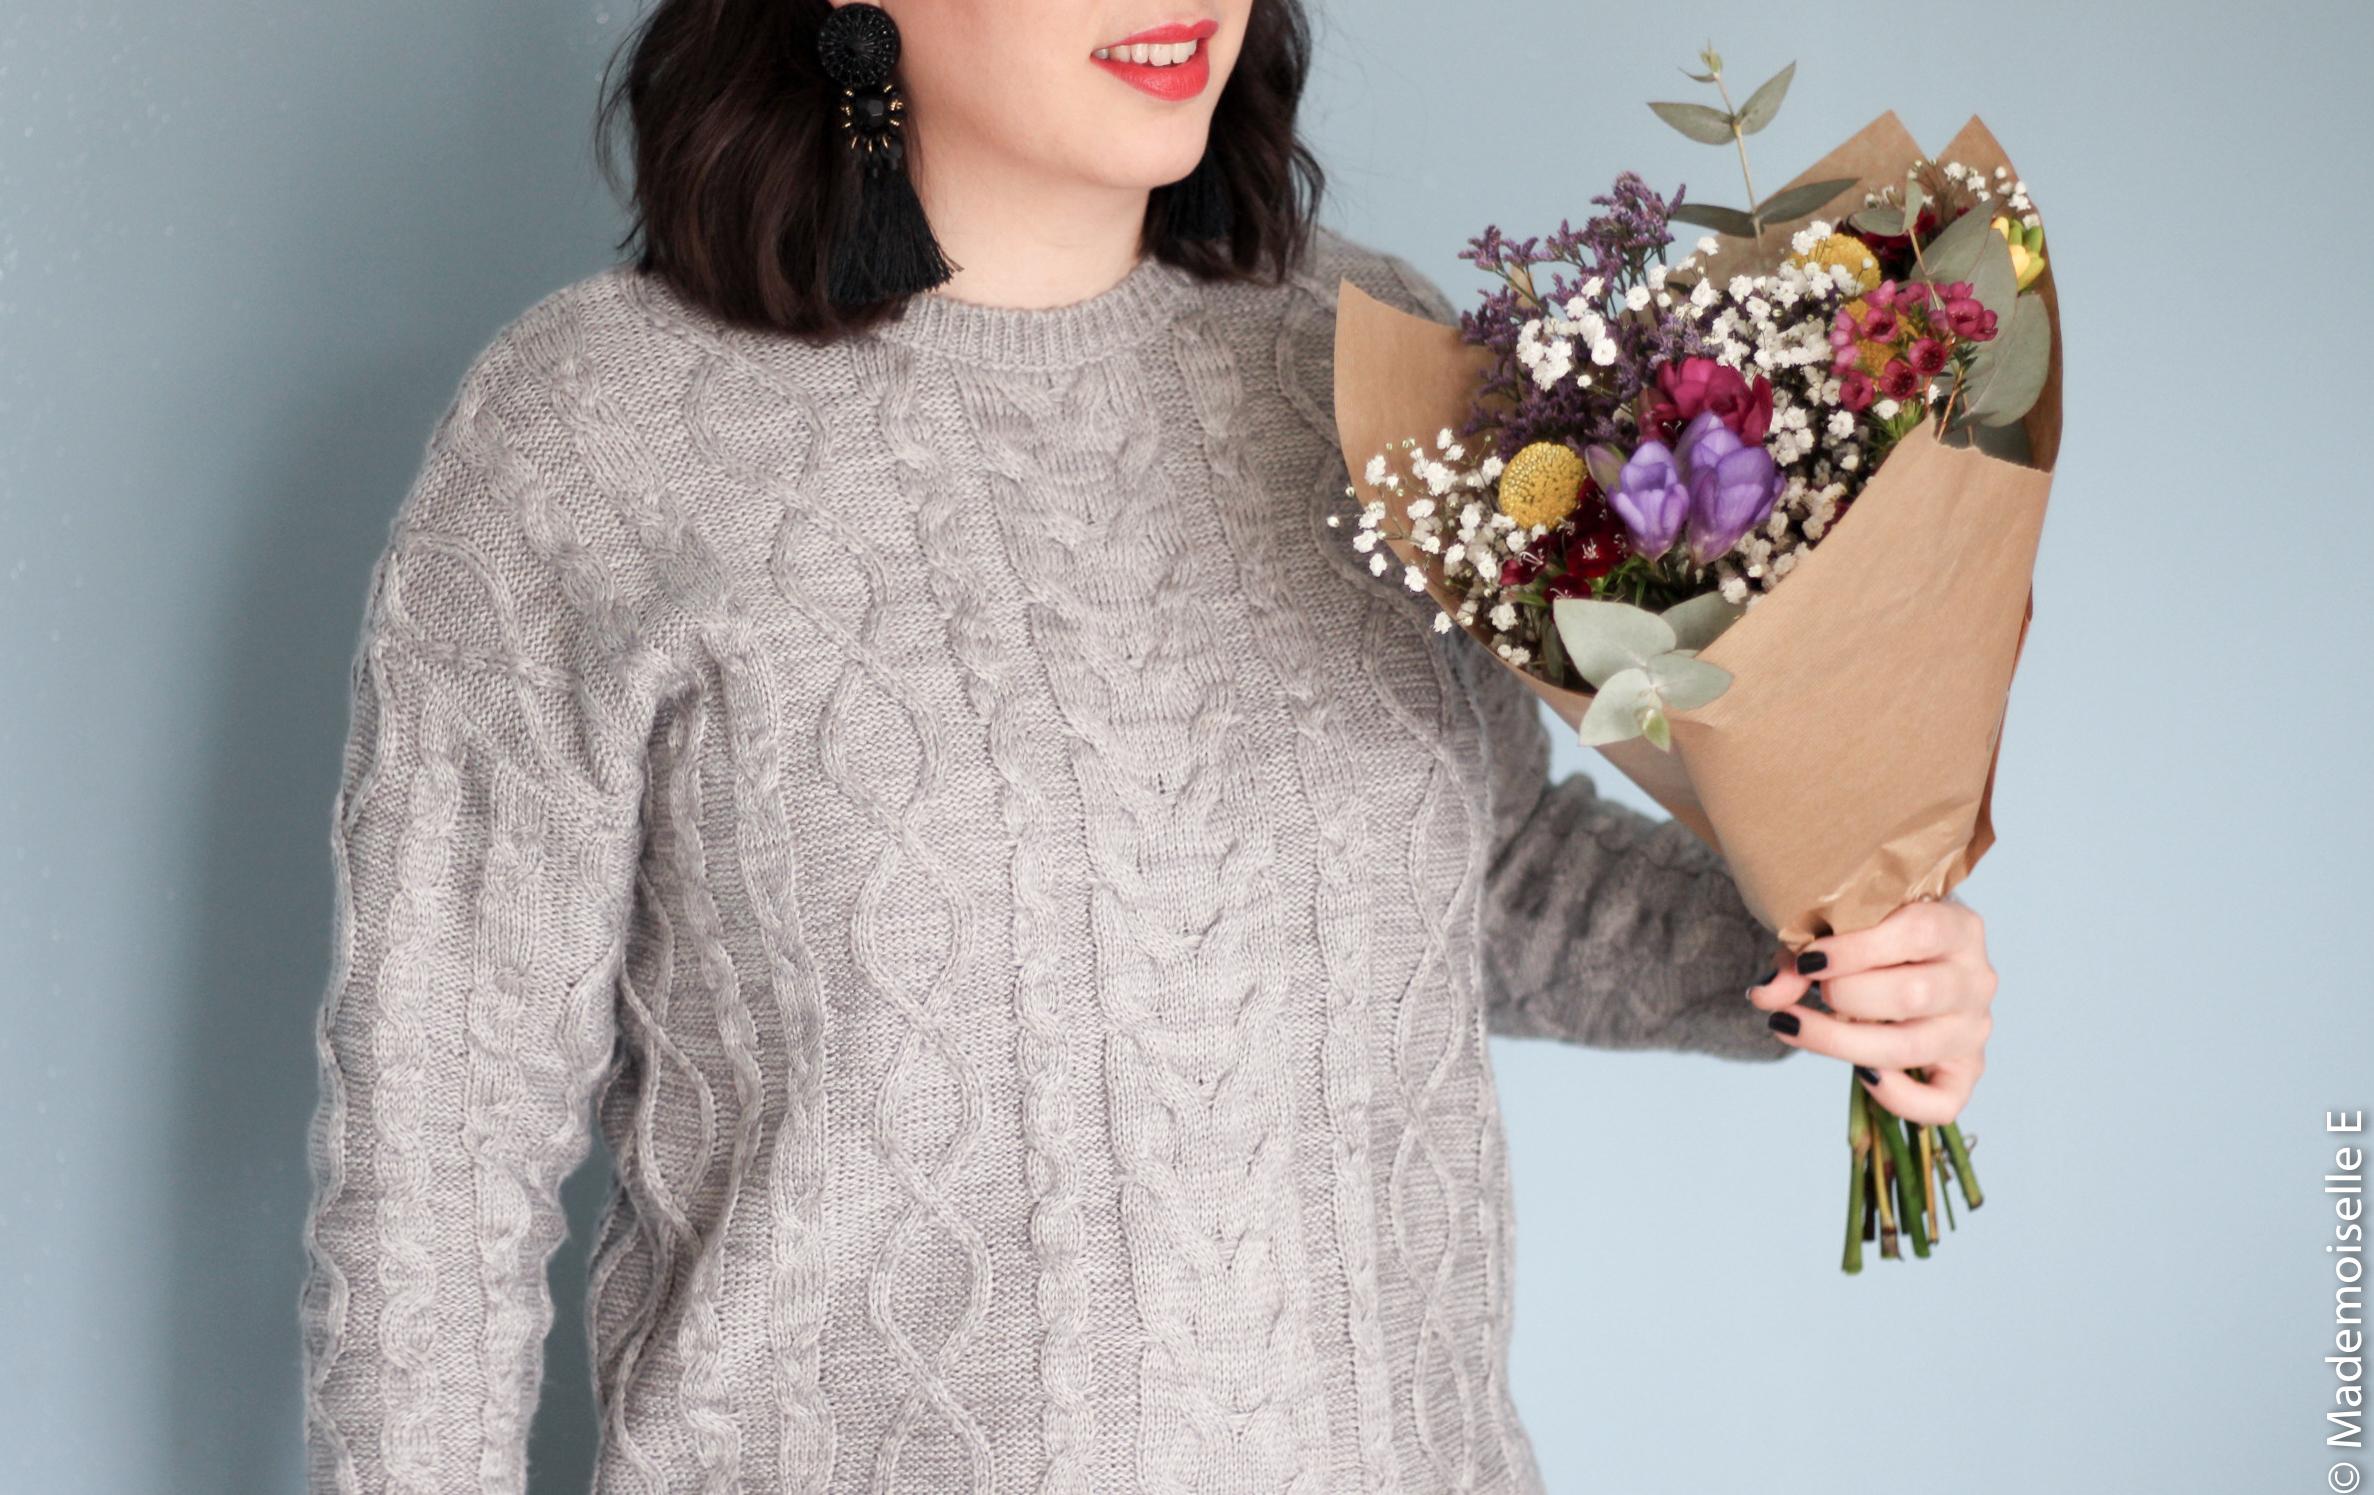 bonheurs #3 Marguerite Flowers Shop mademoiselle-e